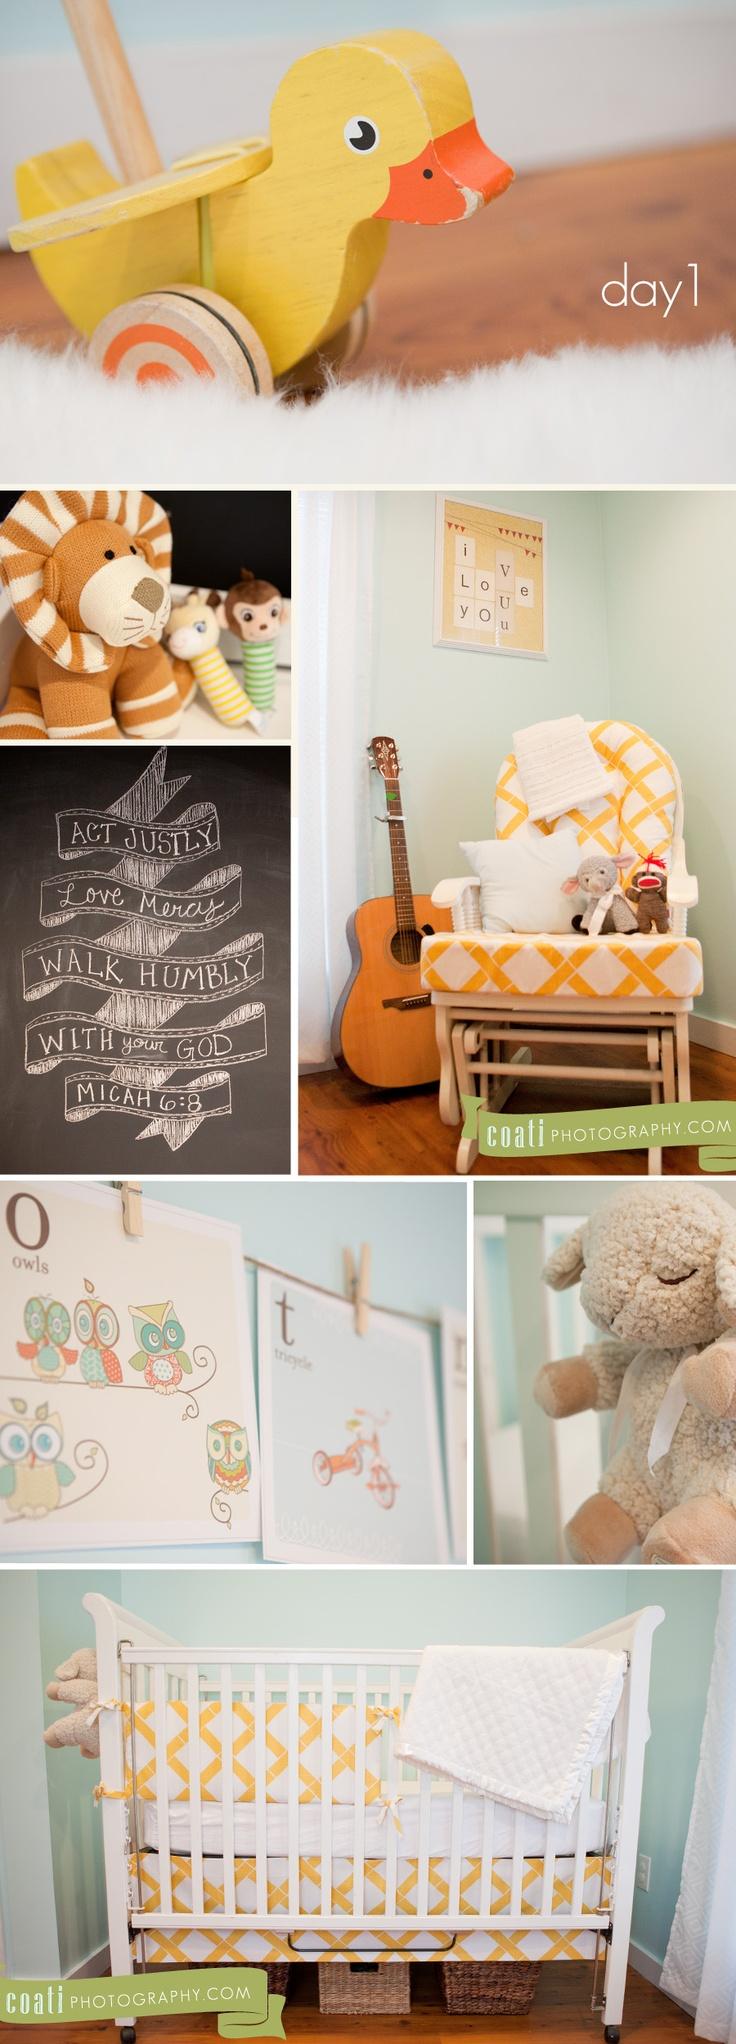 Day1- Neutral Baby Room Love chalkboard Bible verse!;)